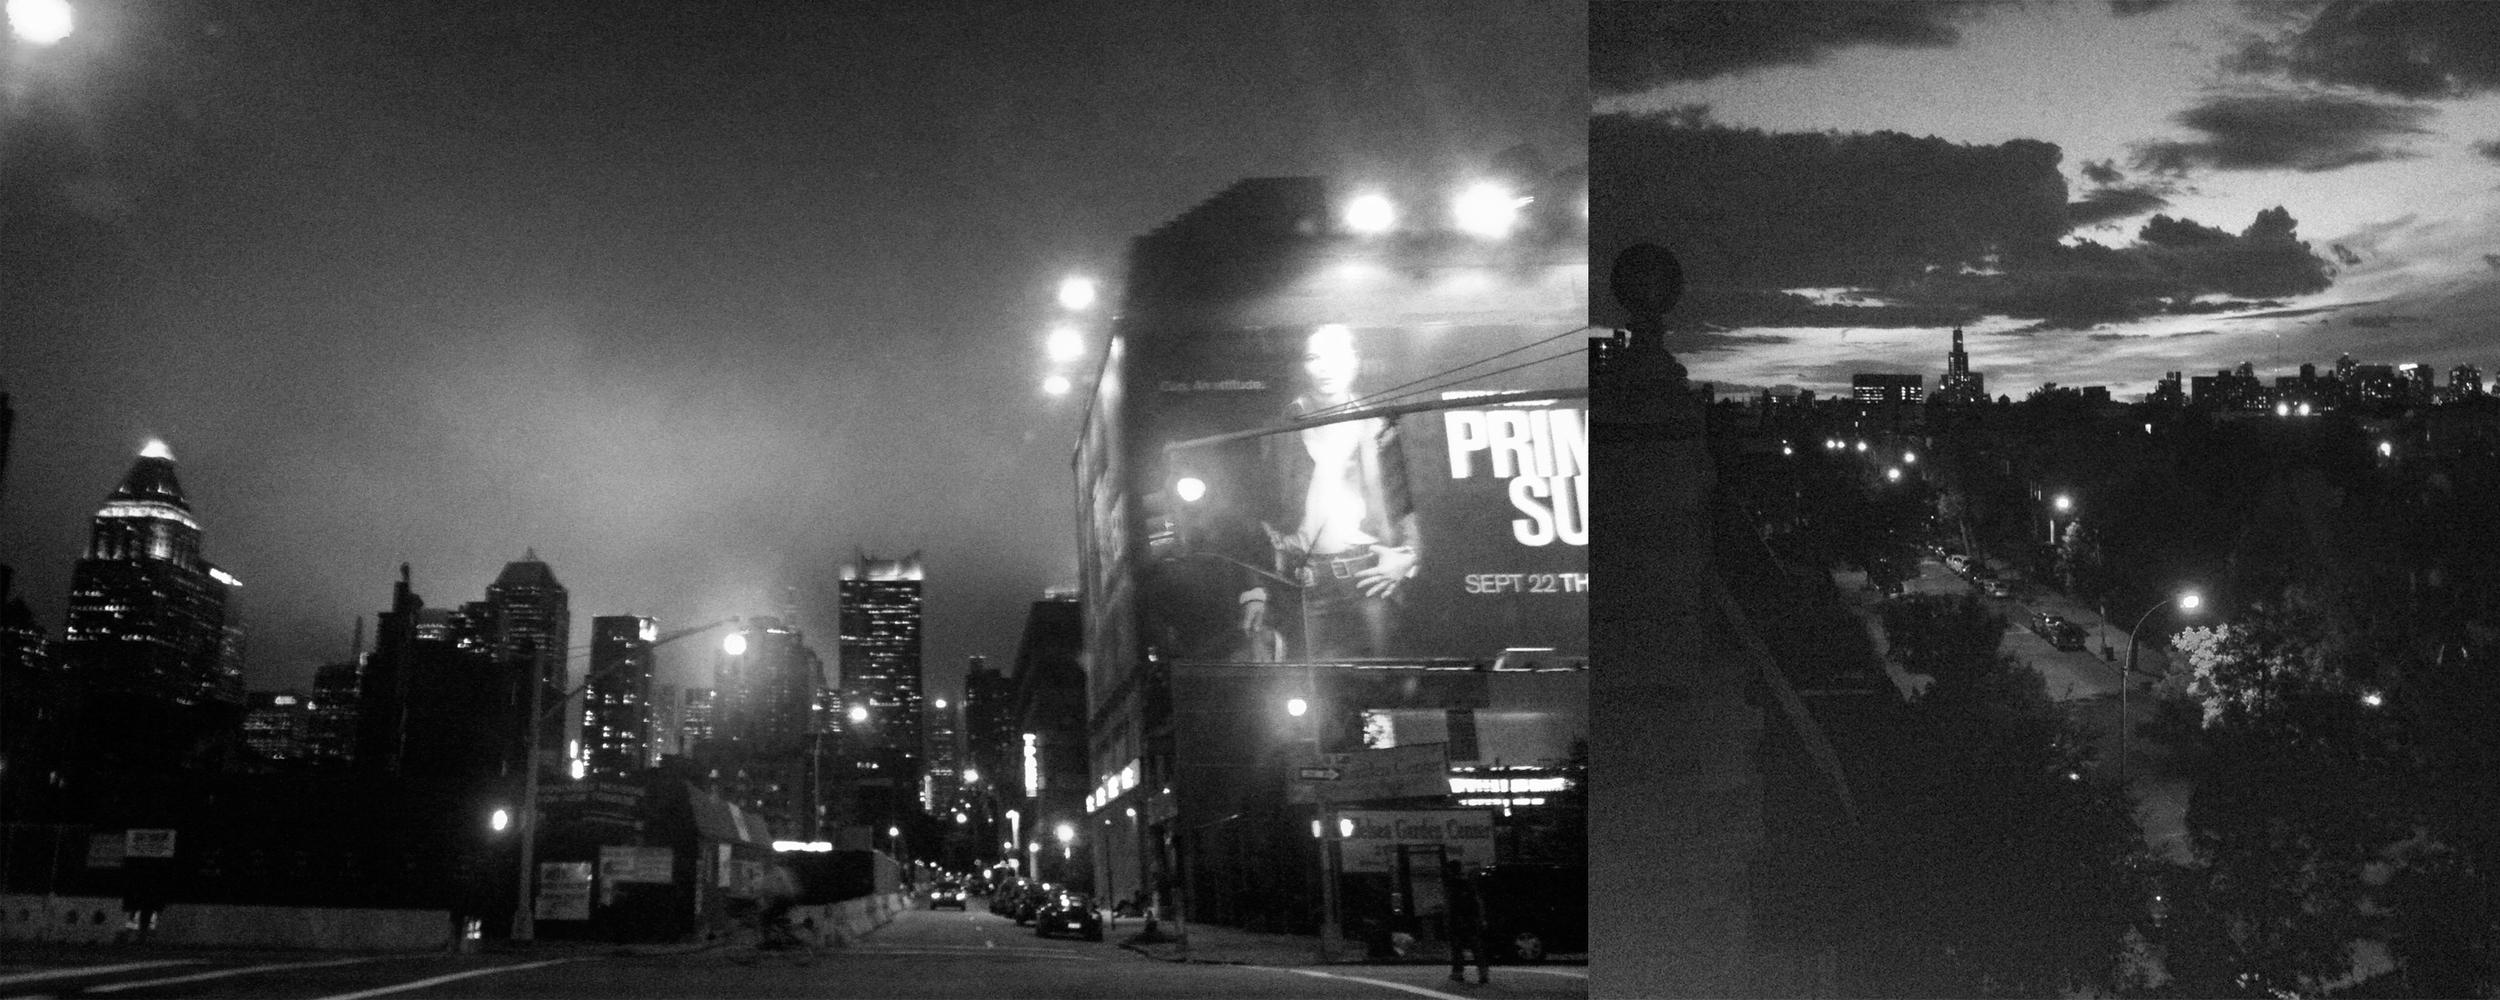 streetlights.jpg